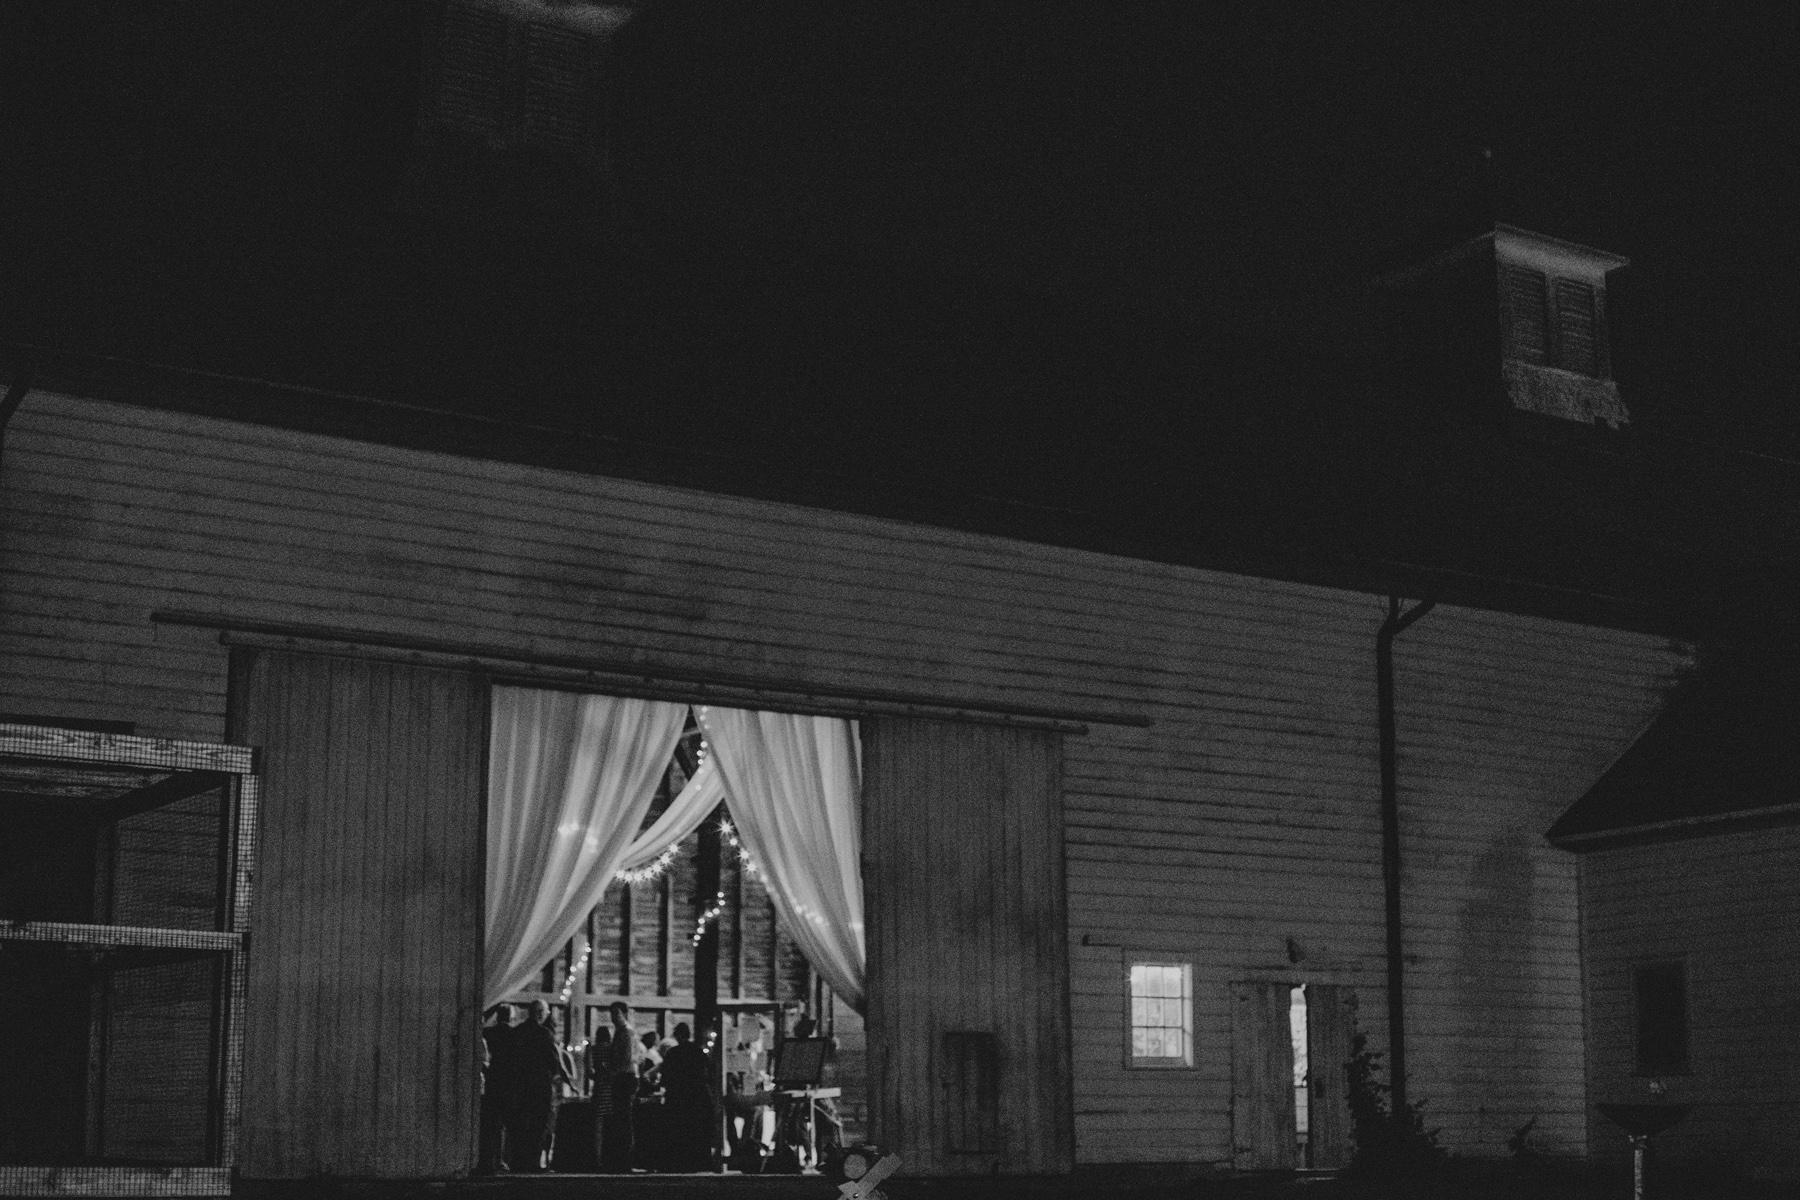 shaker_heritage_barn_wedding_0059.jpg